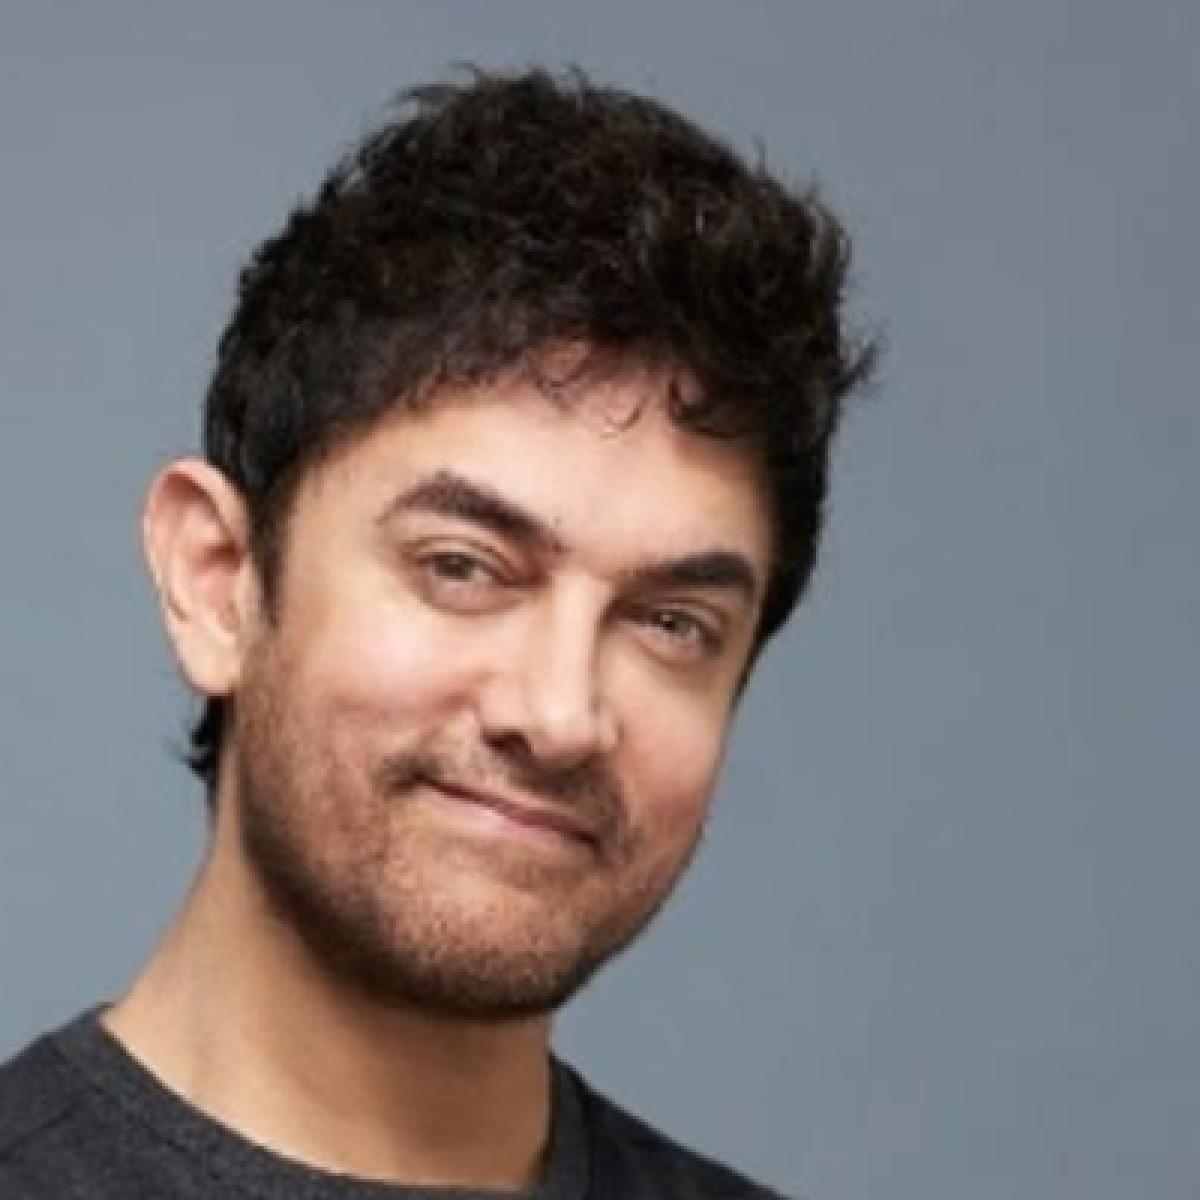 Aamir Khan flies to Bengaluru amidst shooting of Laal Singh Chaddha to watch daughter Ira Khan's play